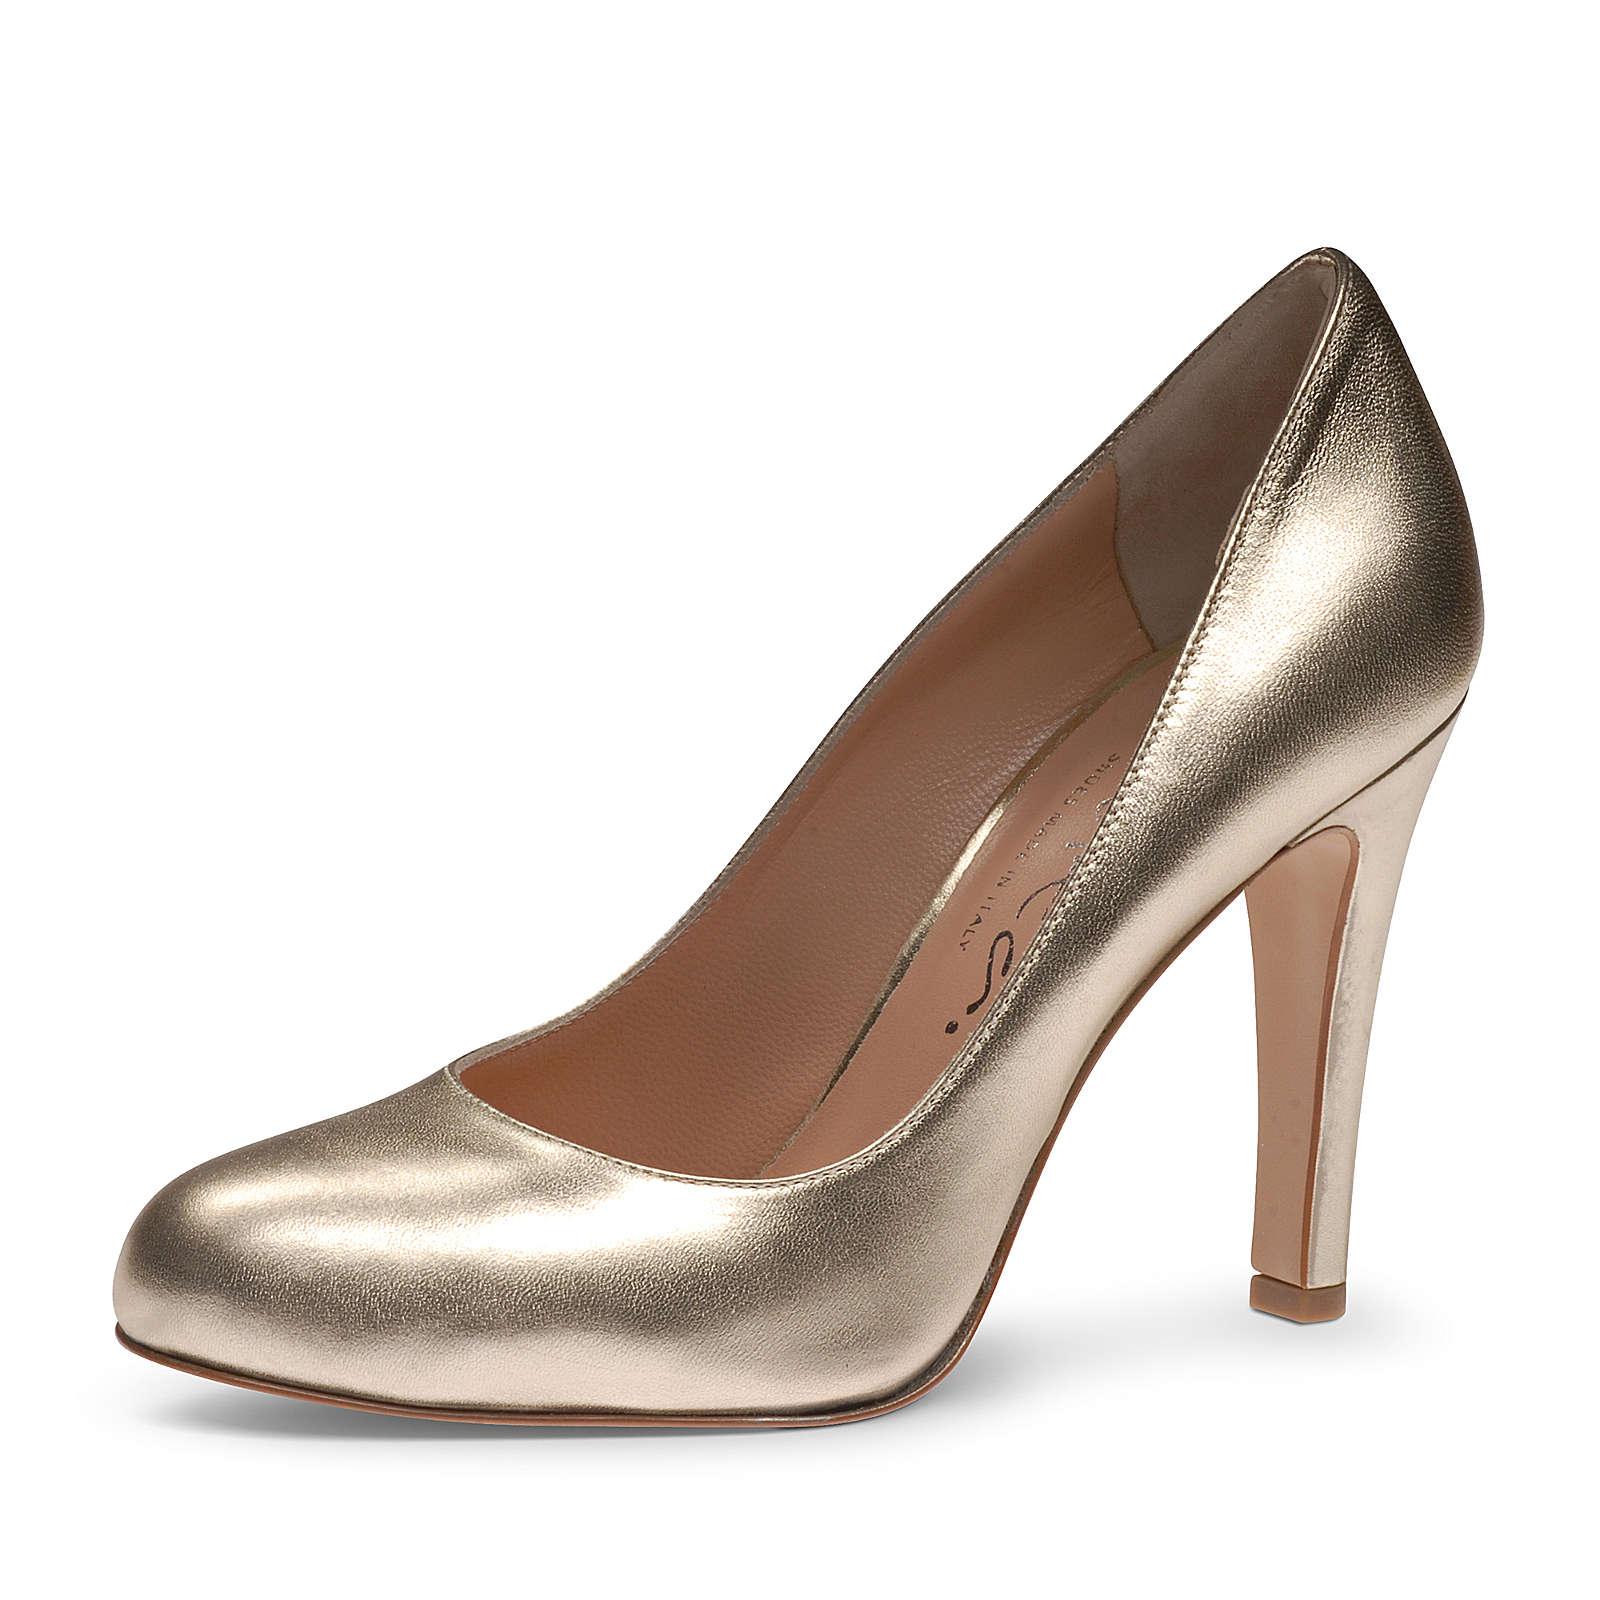 Evita Shoes Pumps gold Damen Gr. 34